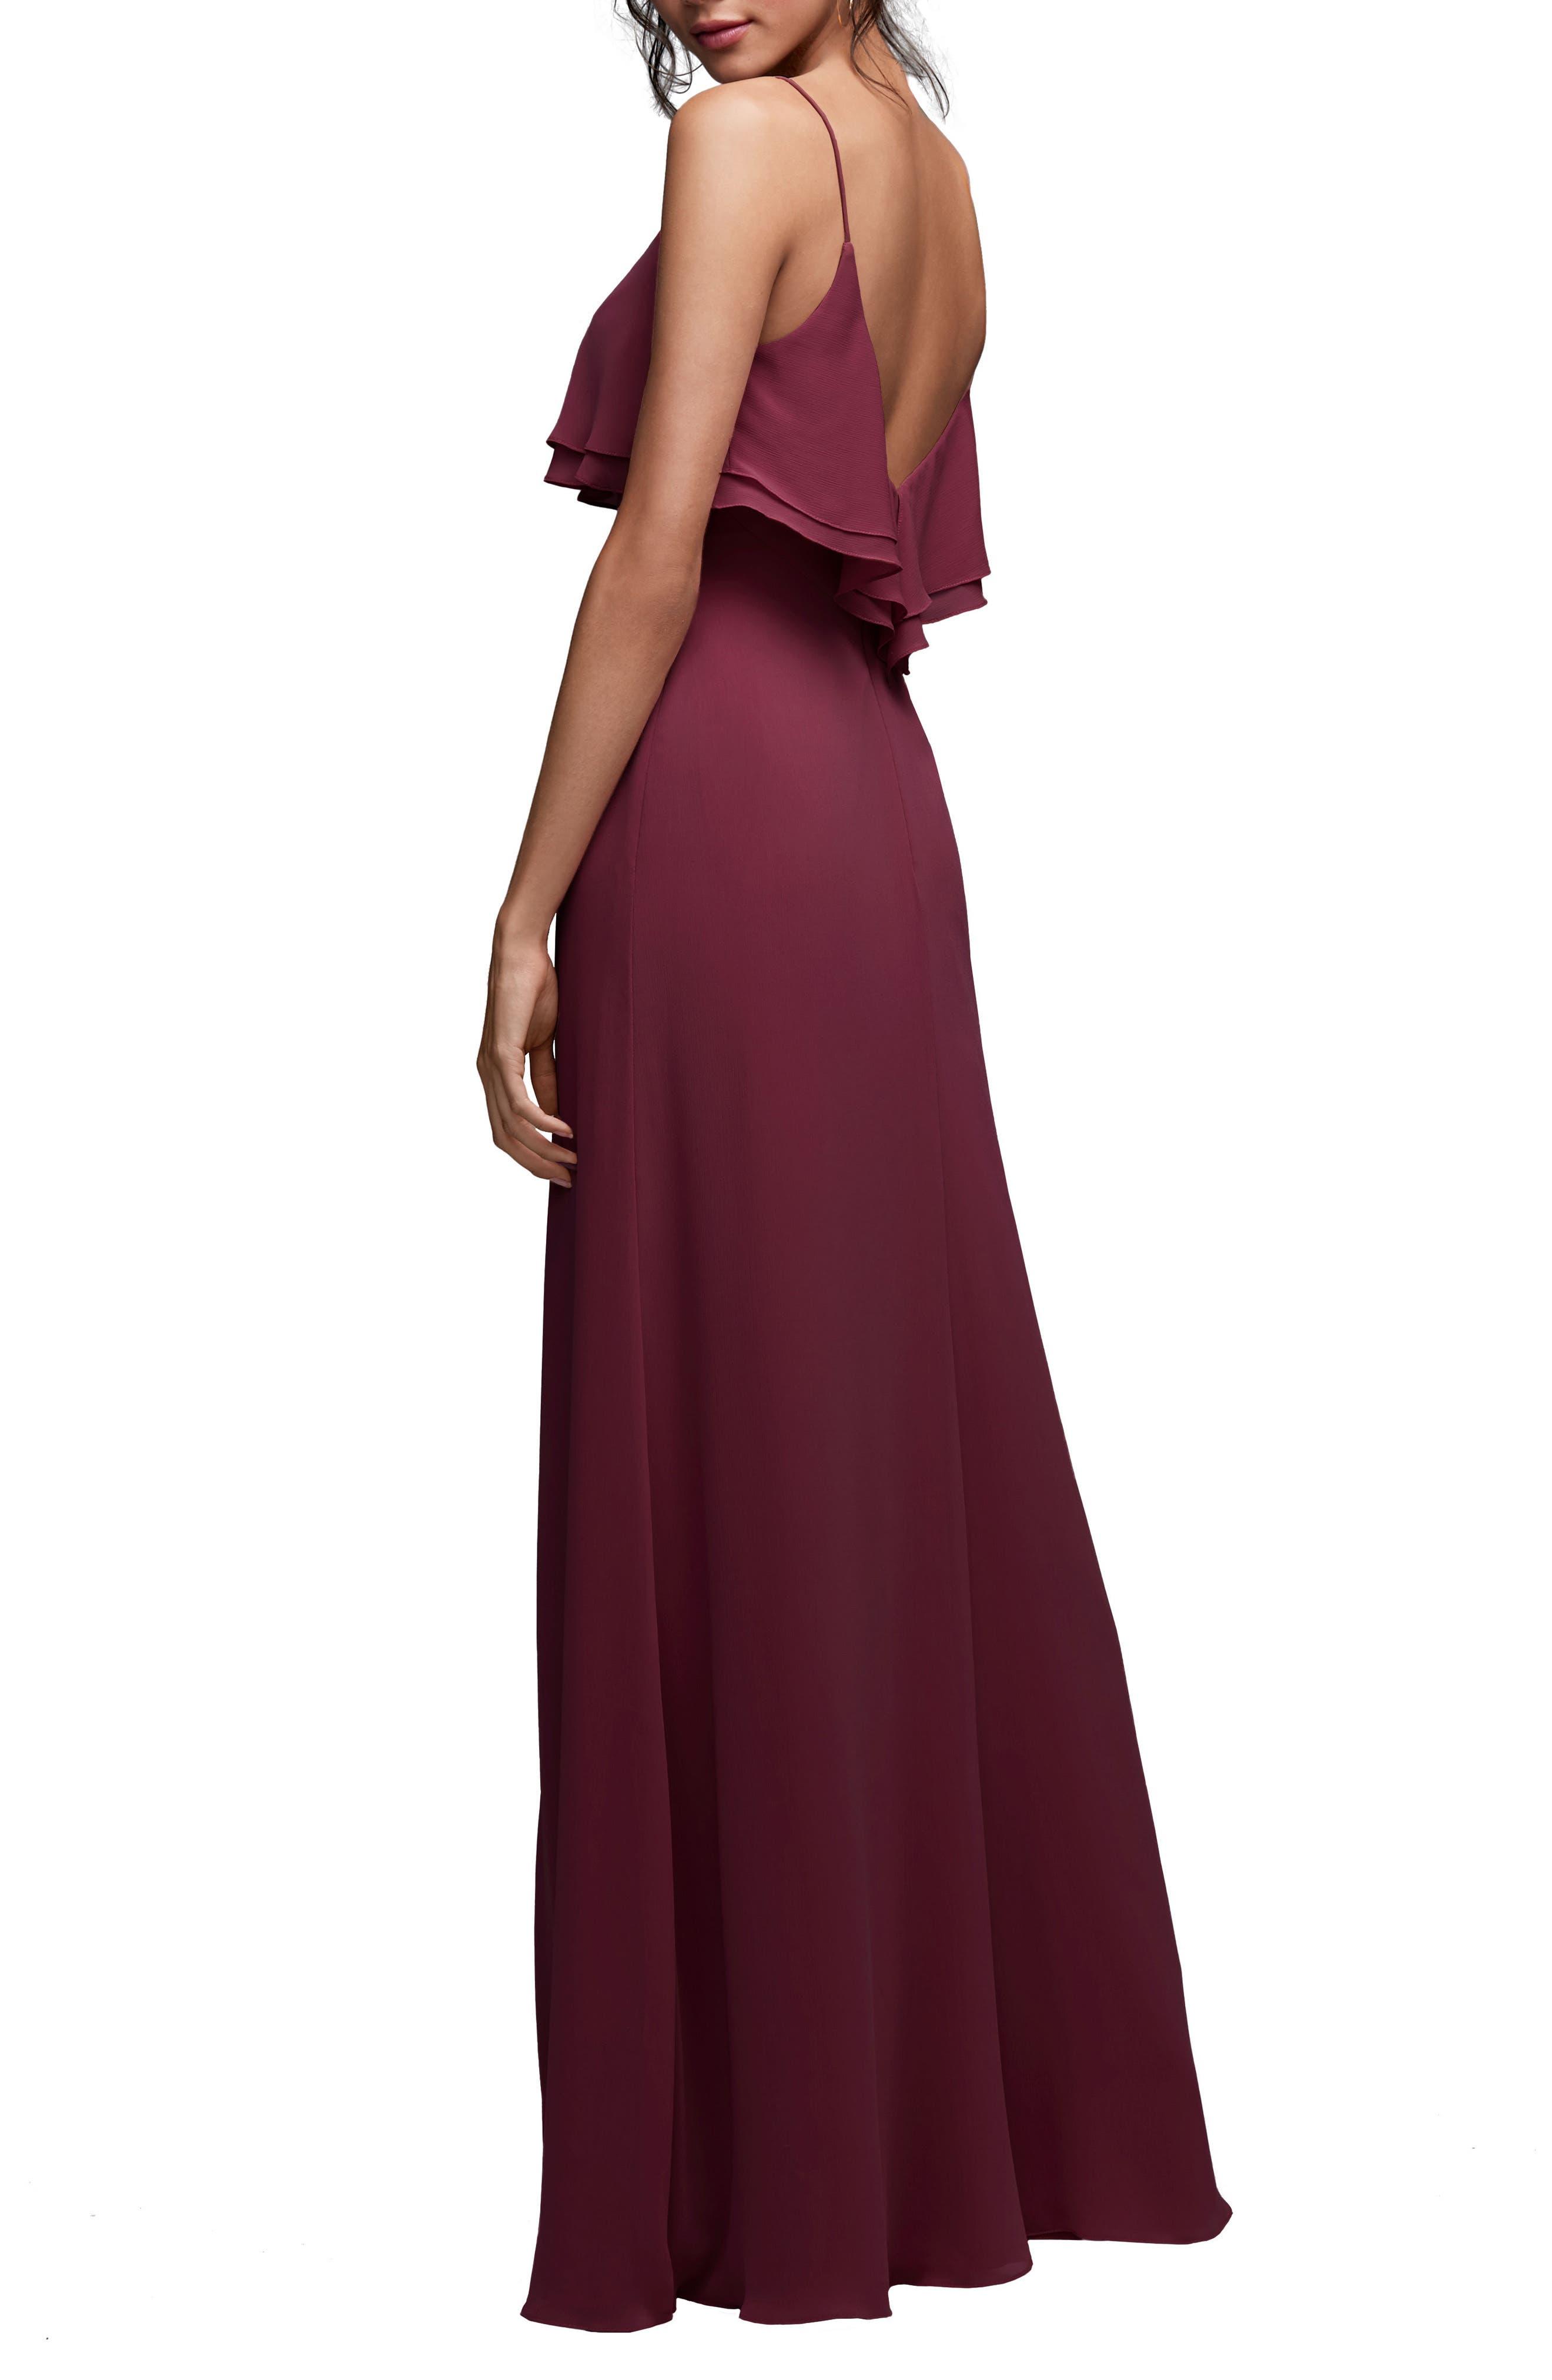 Jasper Ruffle Popover Gown,                             Alternate thumbnail 2, color,                             WINE